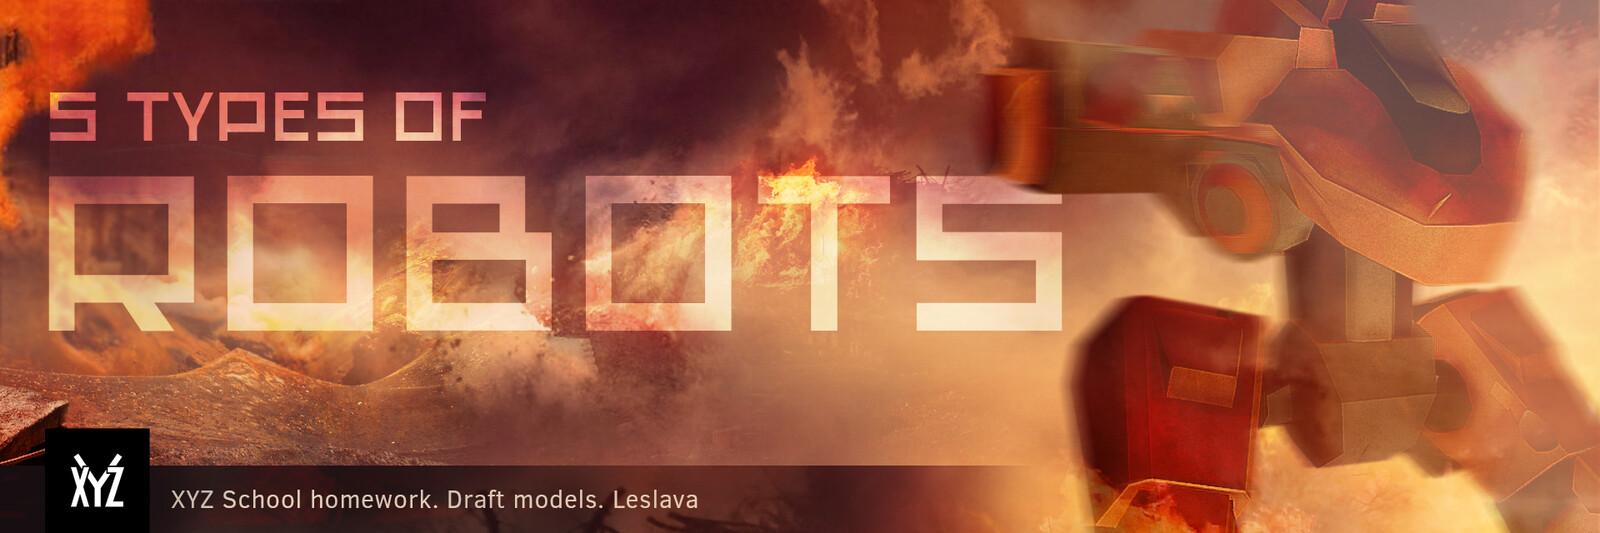 5 types of robots / draft models